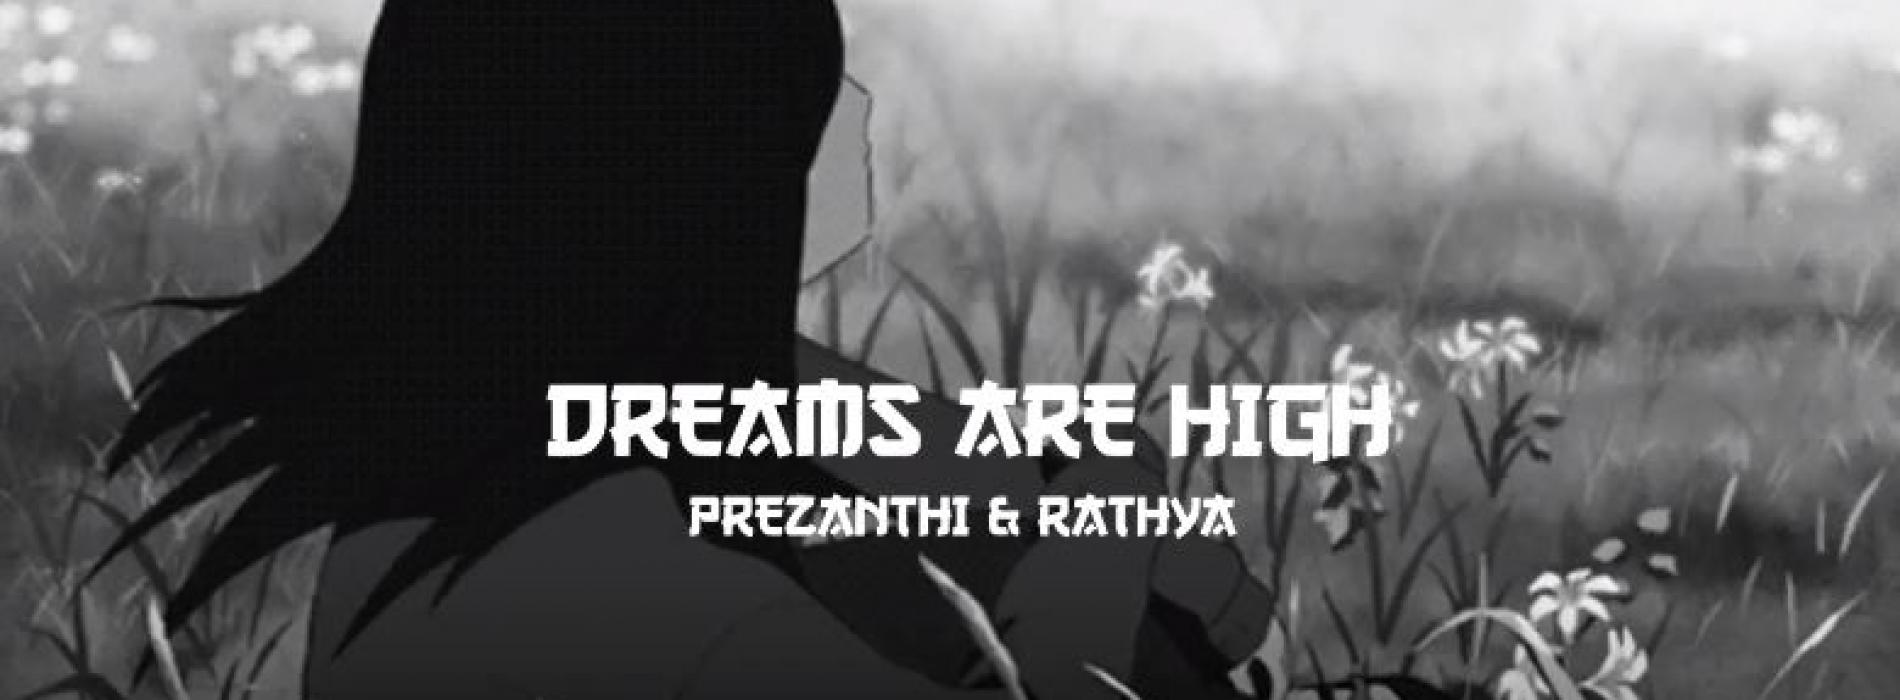 New Music : Dreams Are High – Ayeshmantha Ft Prezanthi & Rathya